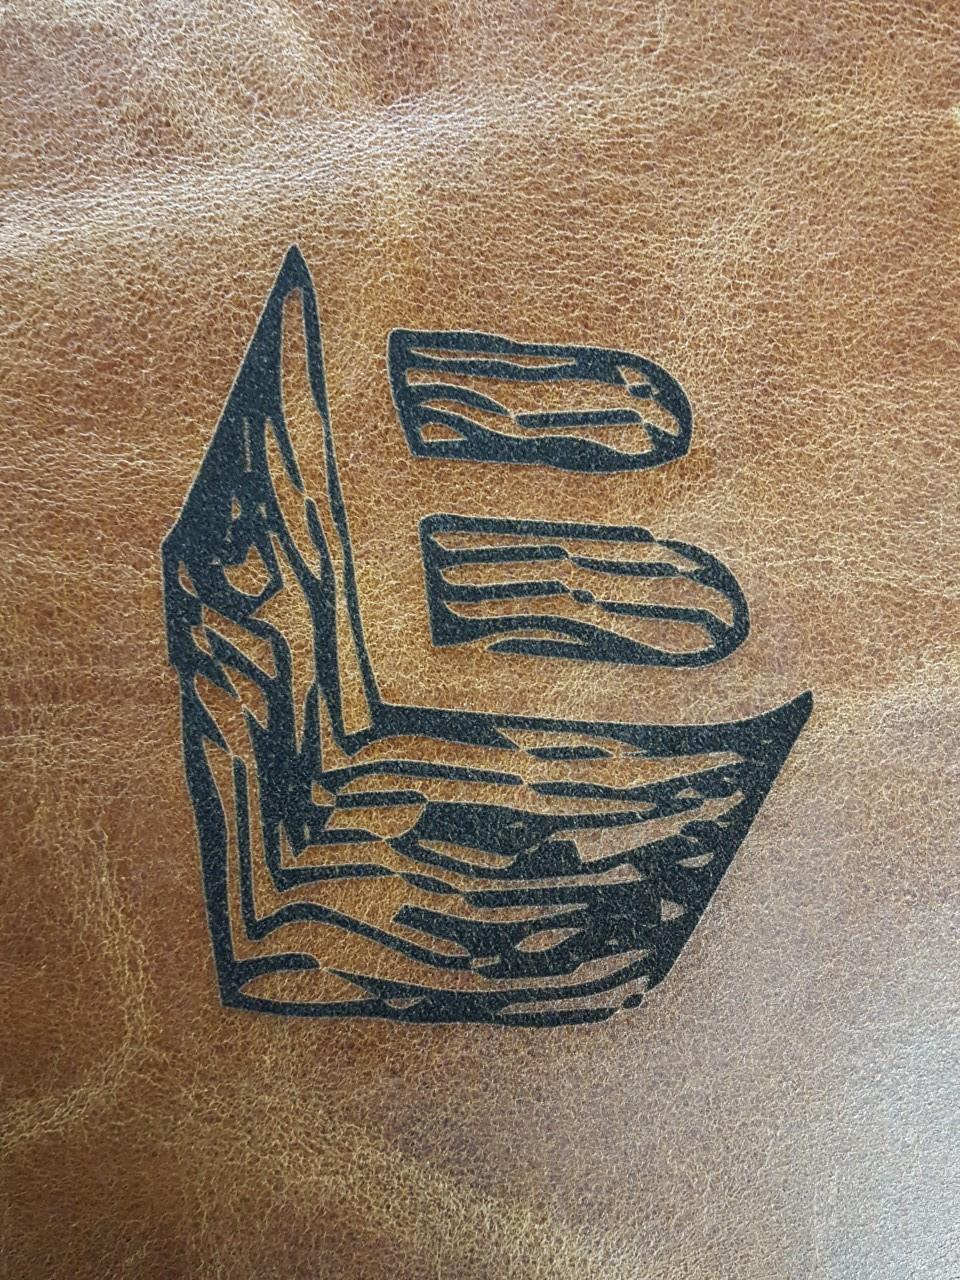 Boltisbbq egen logotyp B